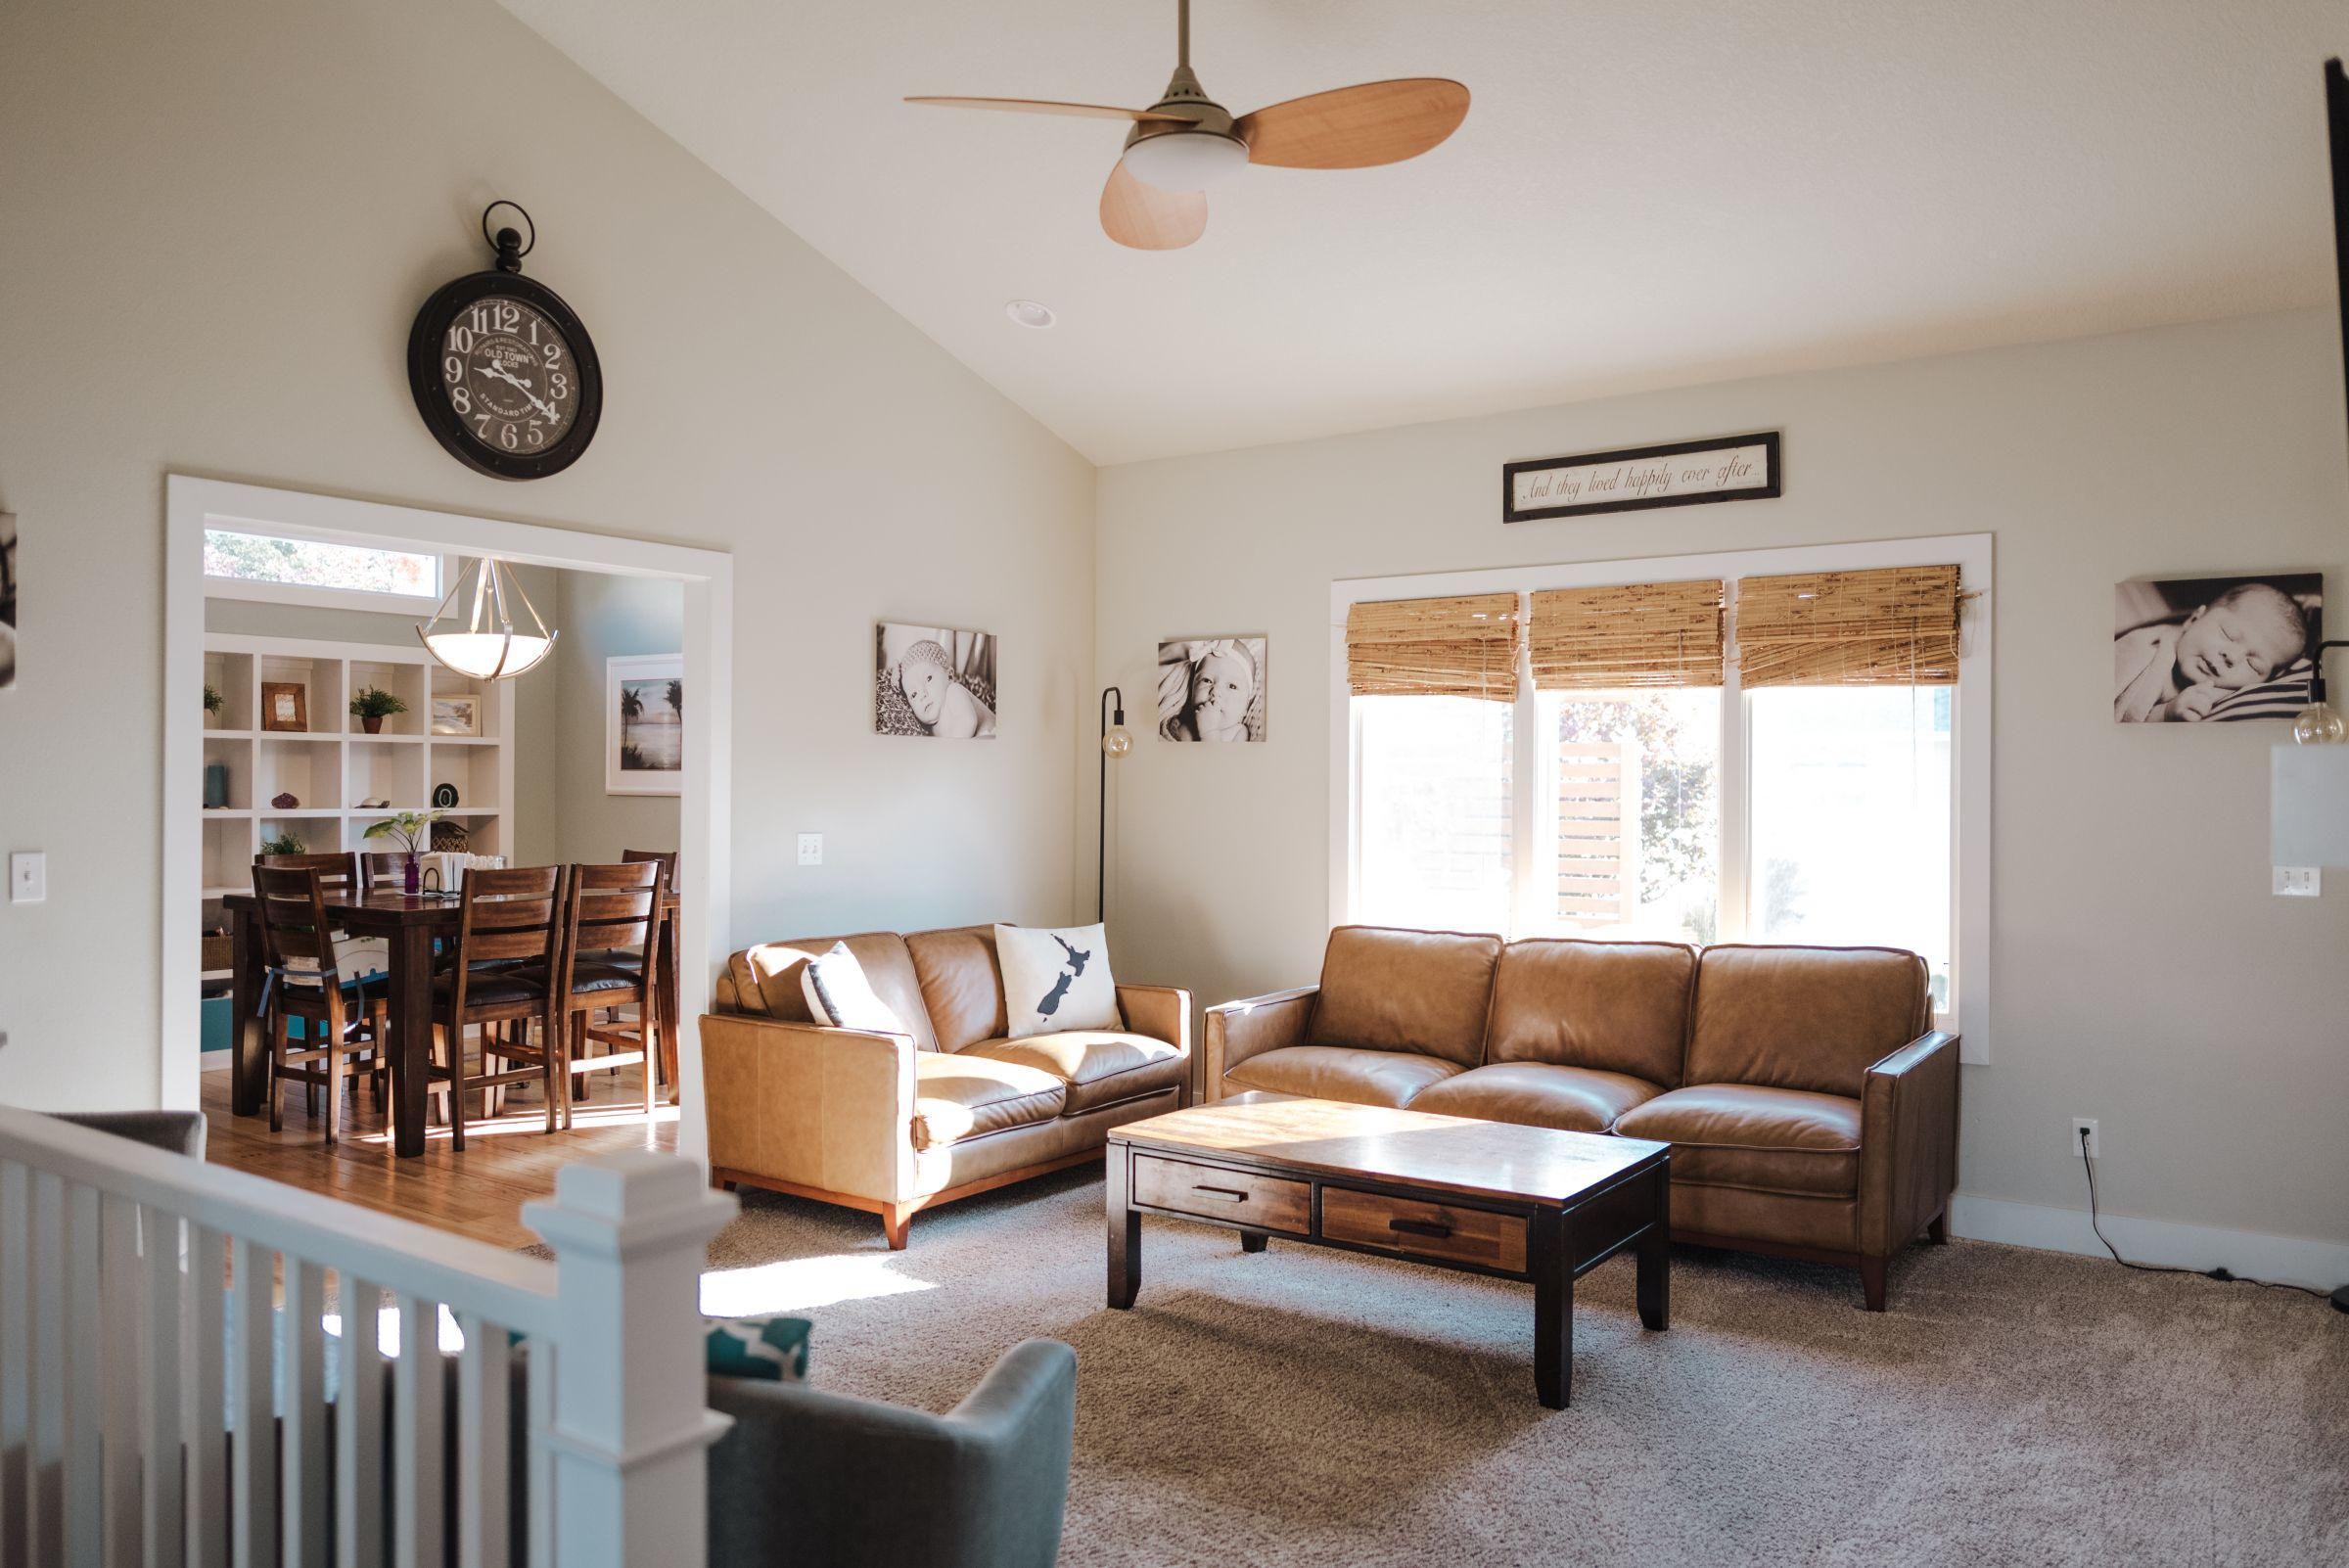 residential-warren-county-iowa-0-acres-listing-number-15204-5-2020-10-08-180119.jpg